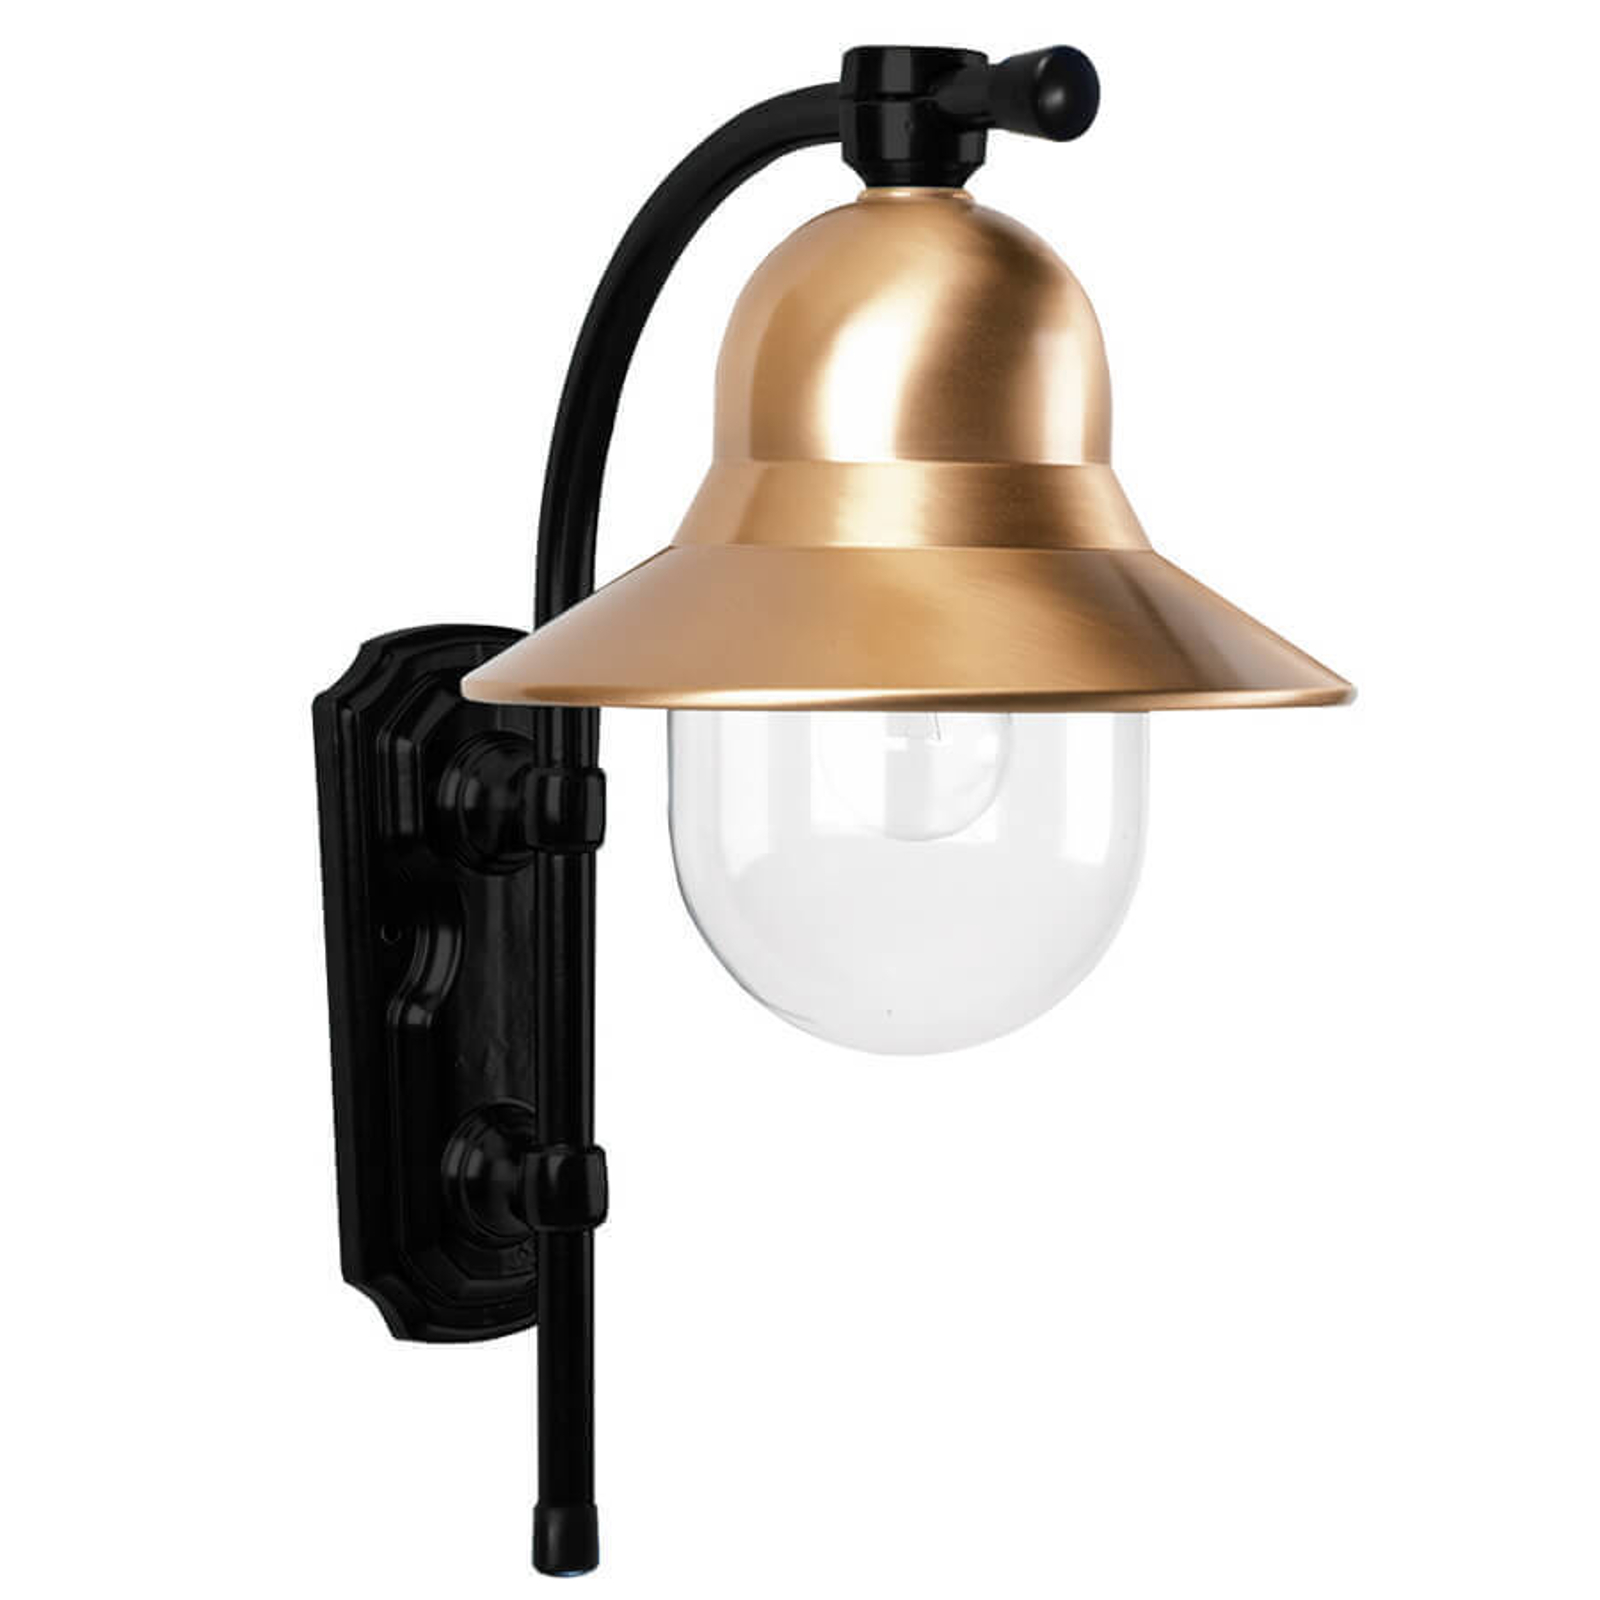 Tijdloze buitenwandlamp Toscane, zwart